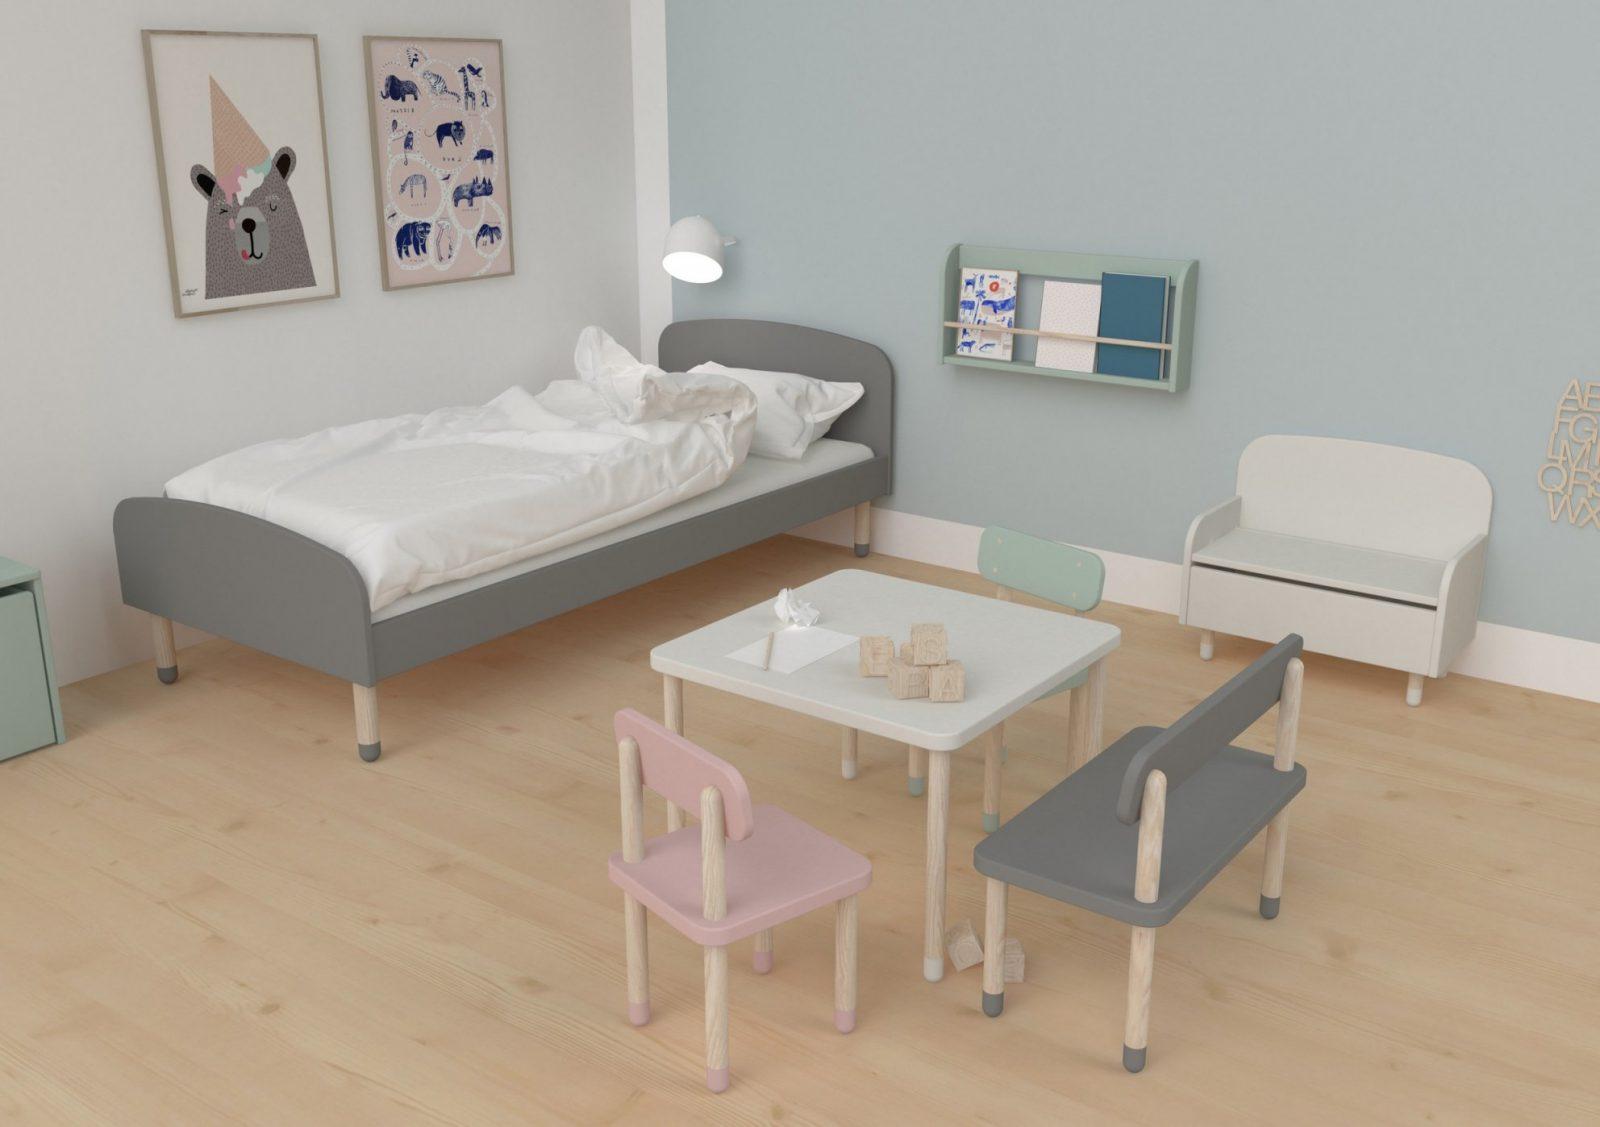 Sitzbank Flexa Play Mit Stauraum – Weiß  Emob von Sitzbank Weiß Mit Stauraum Bild